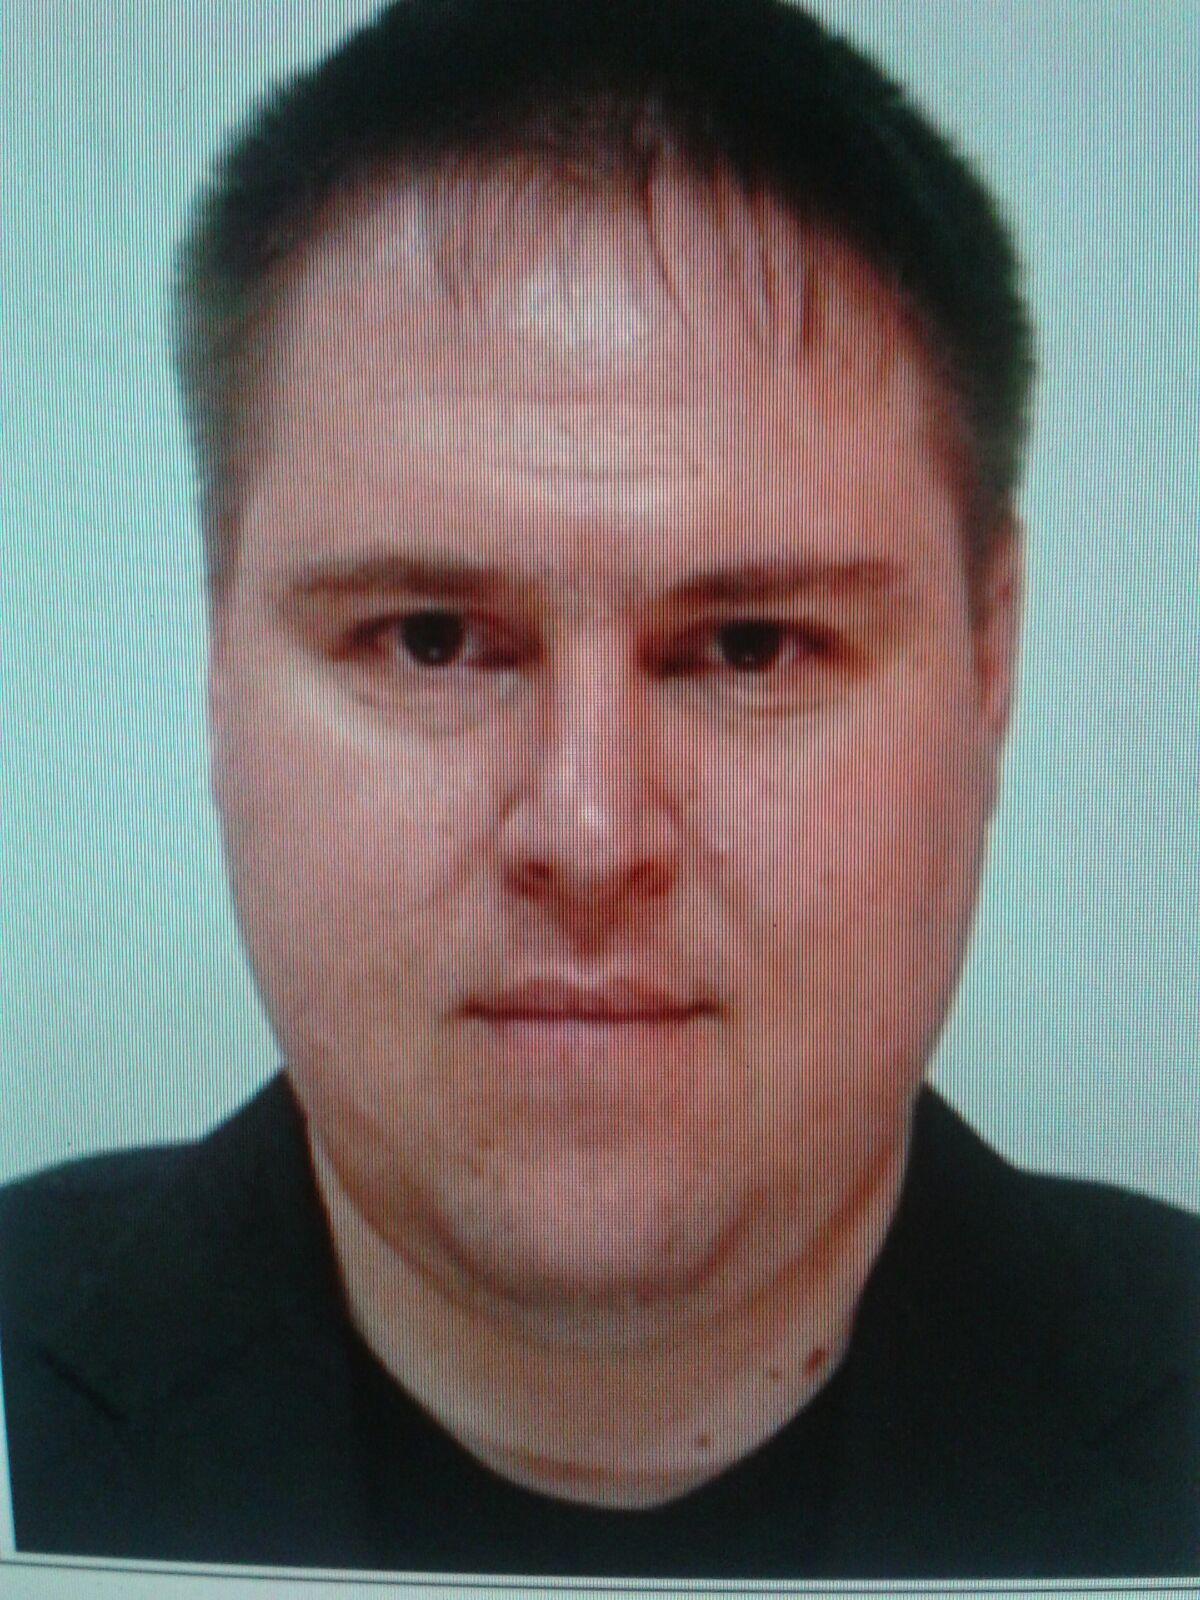 Розыск преступников в беларуси фото